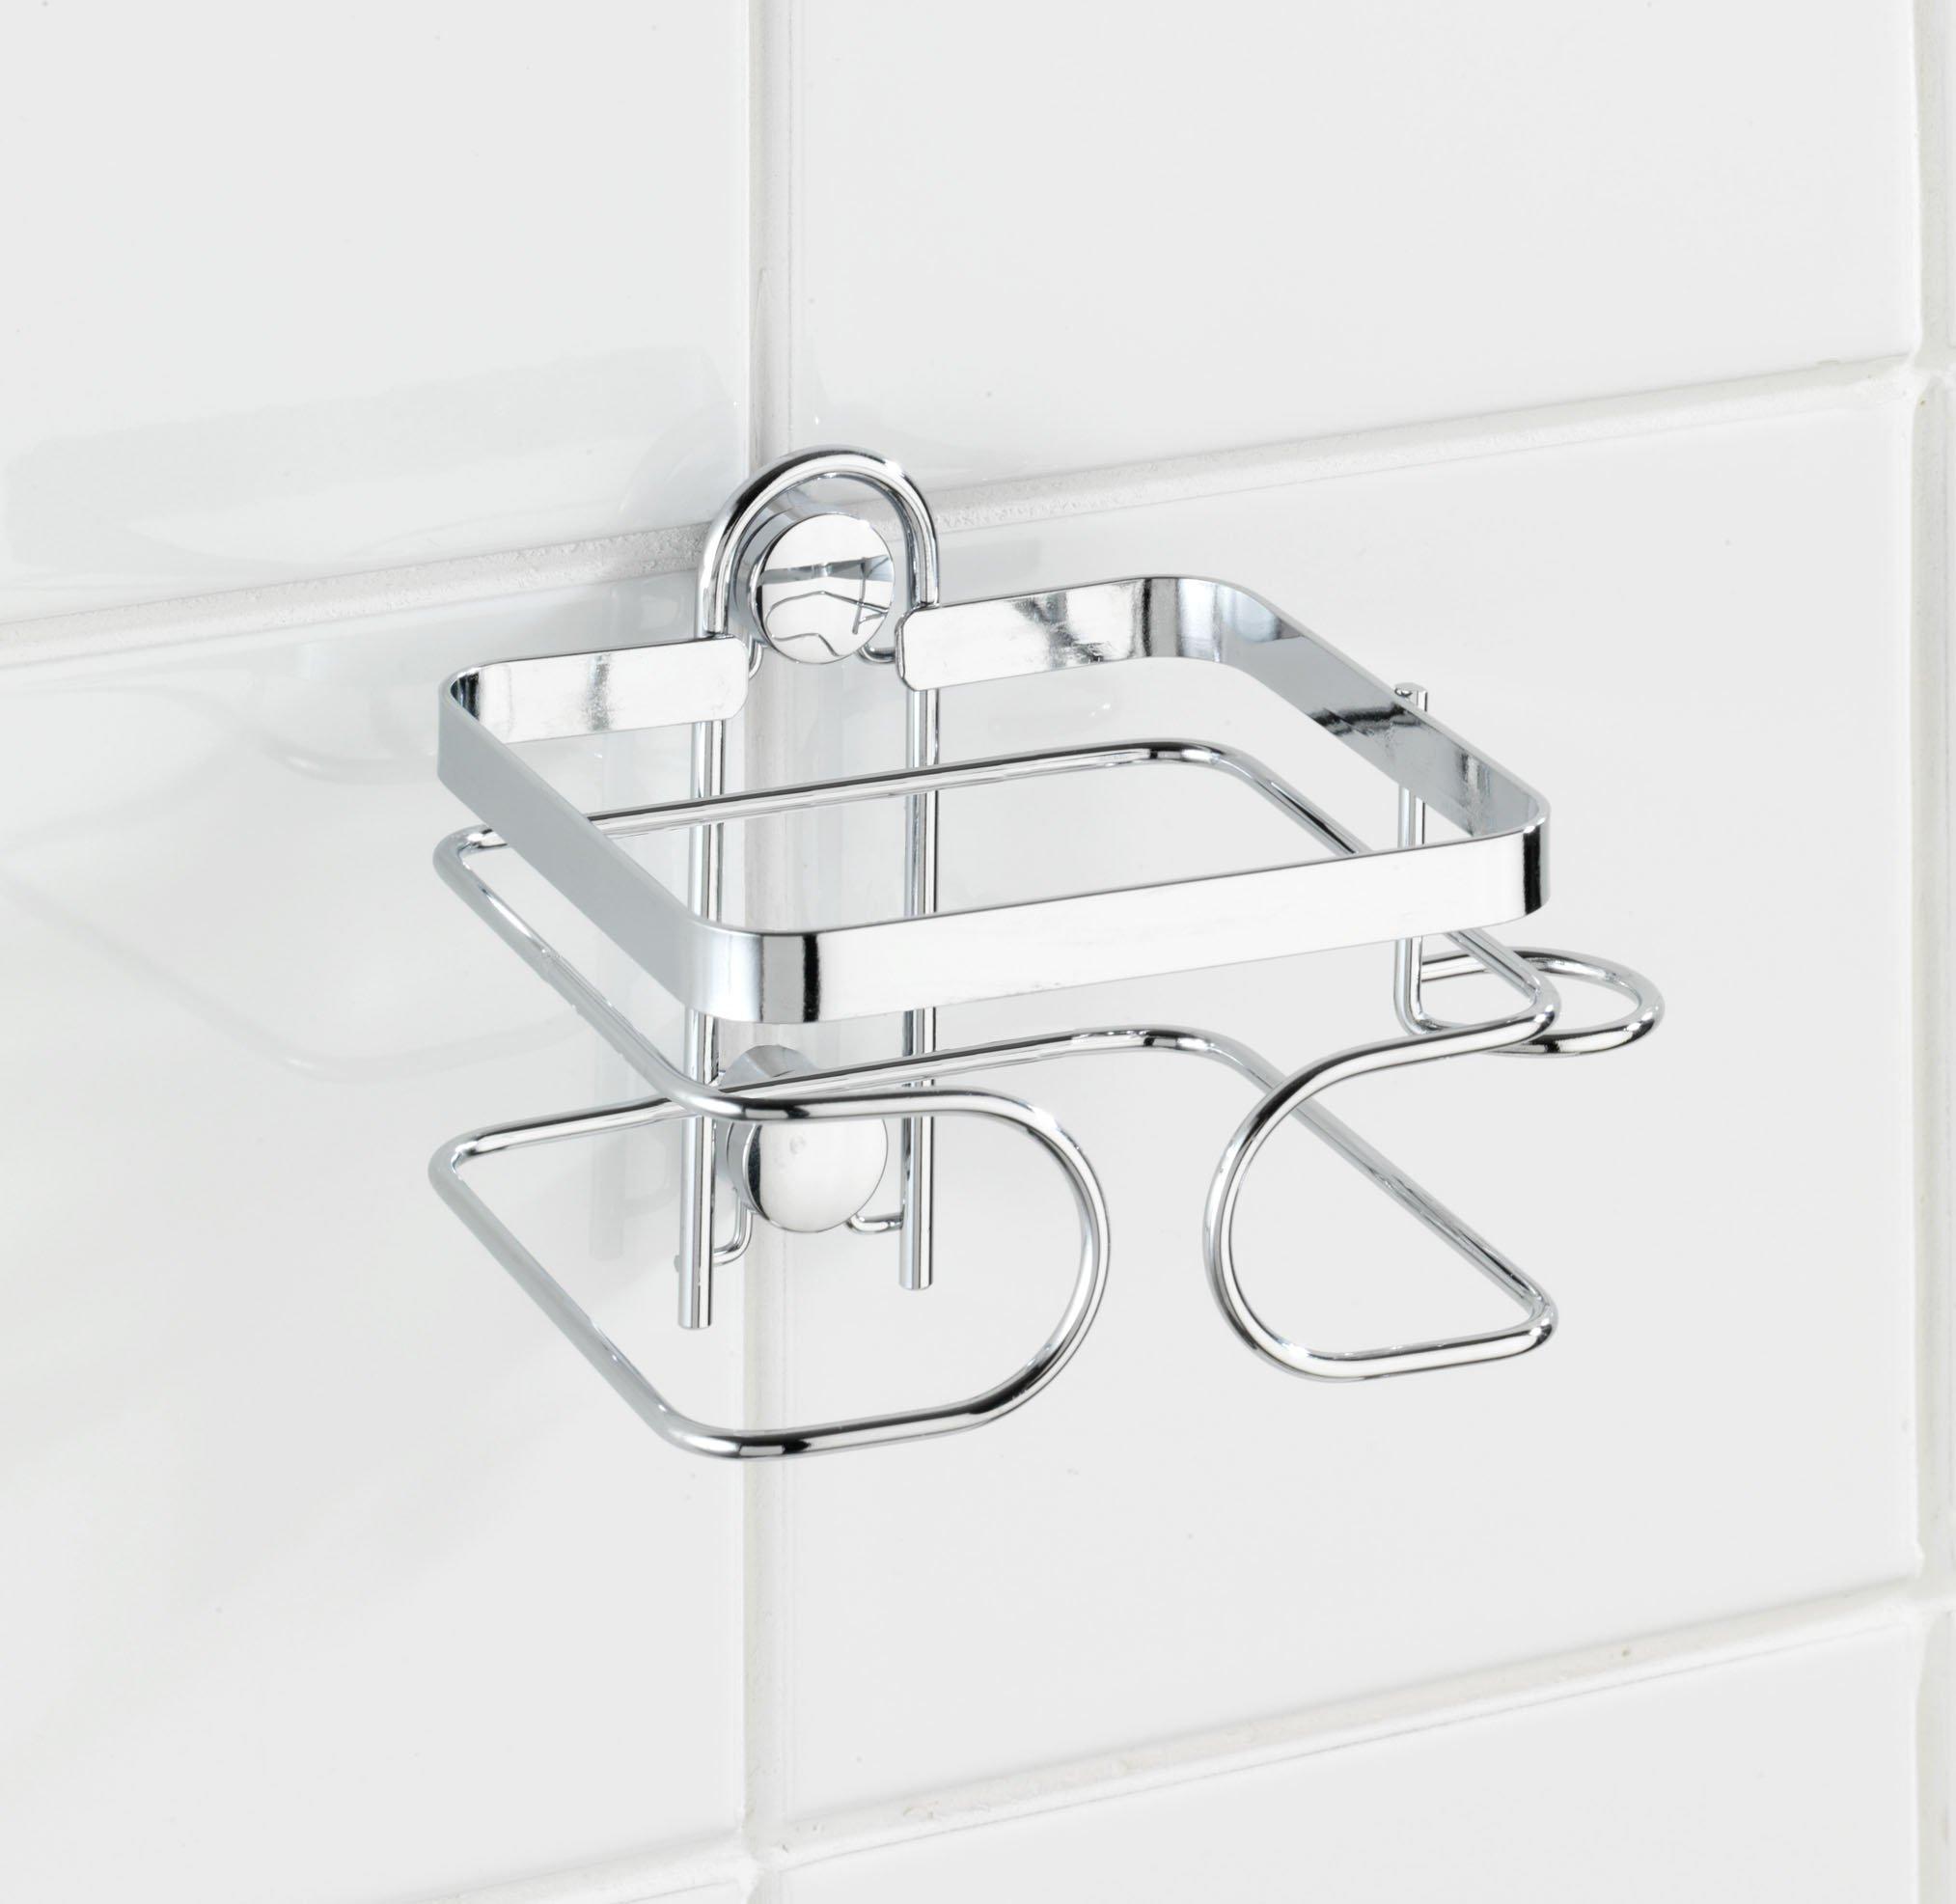 wenko 20413100 premium porte s che cheveux inox dimensions 15 x 11 x 12 cm inspid co. Black Bedroom Furniture Sets. Home Design Ideas